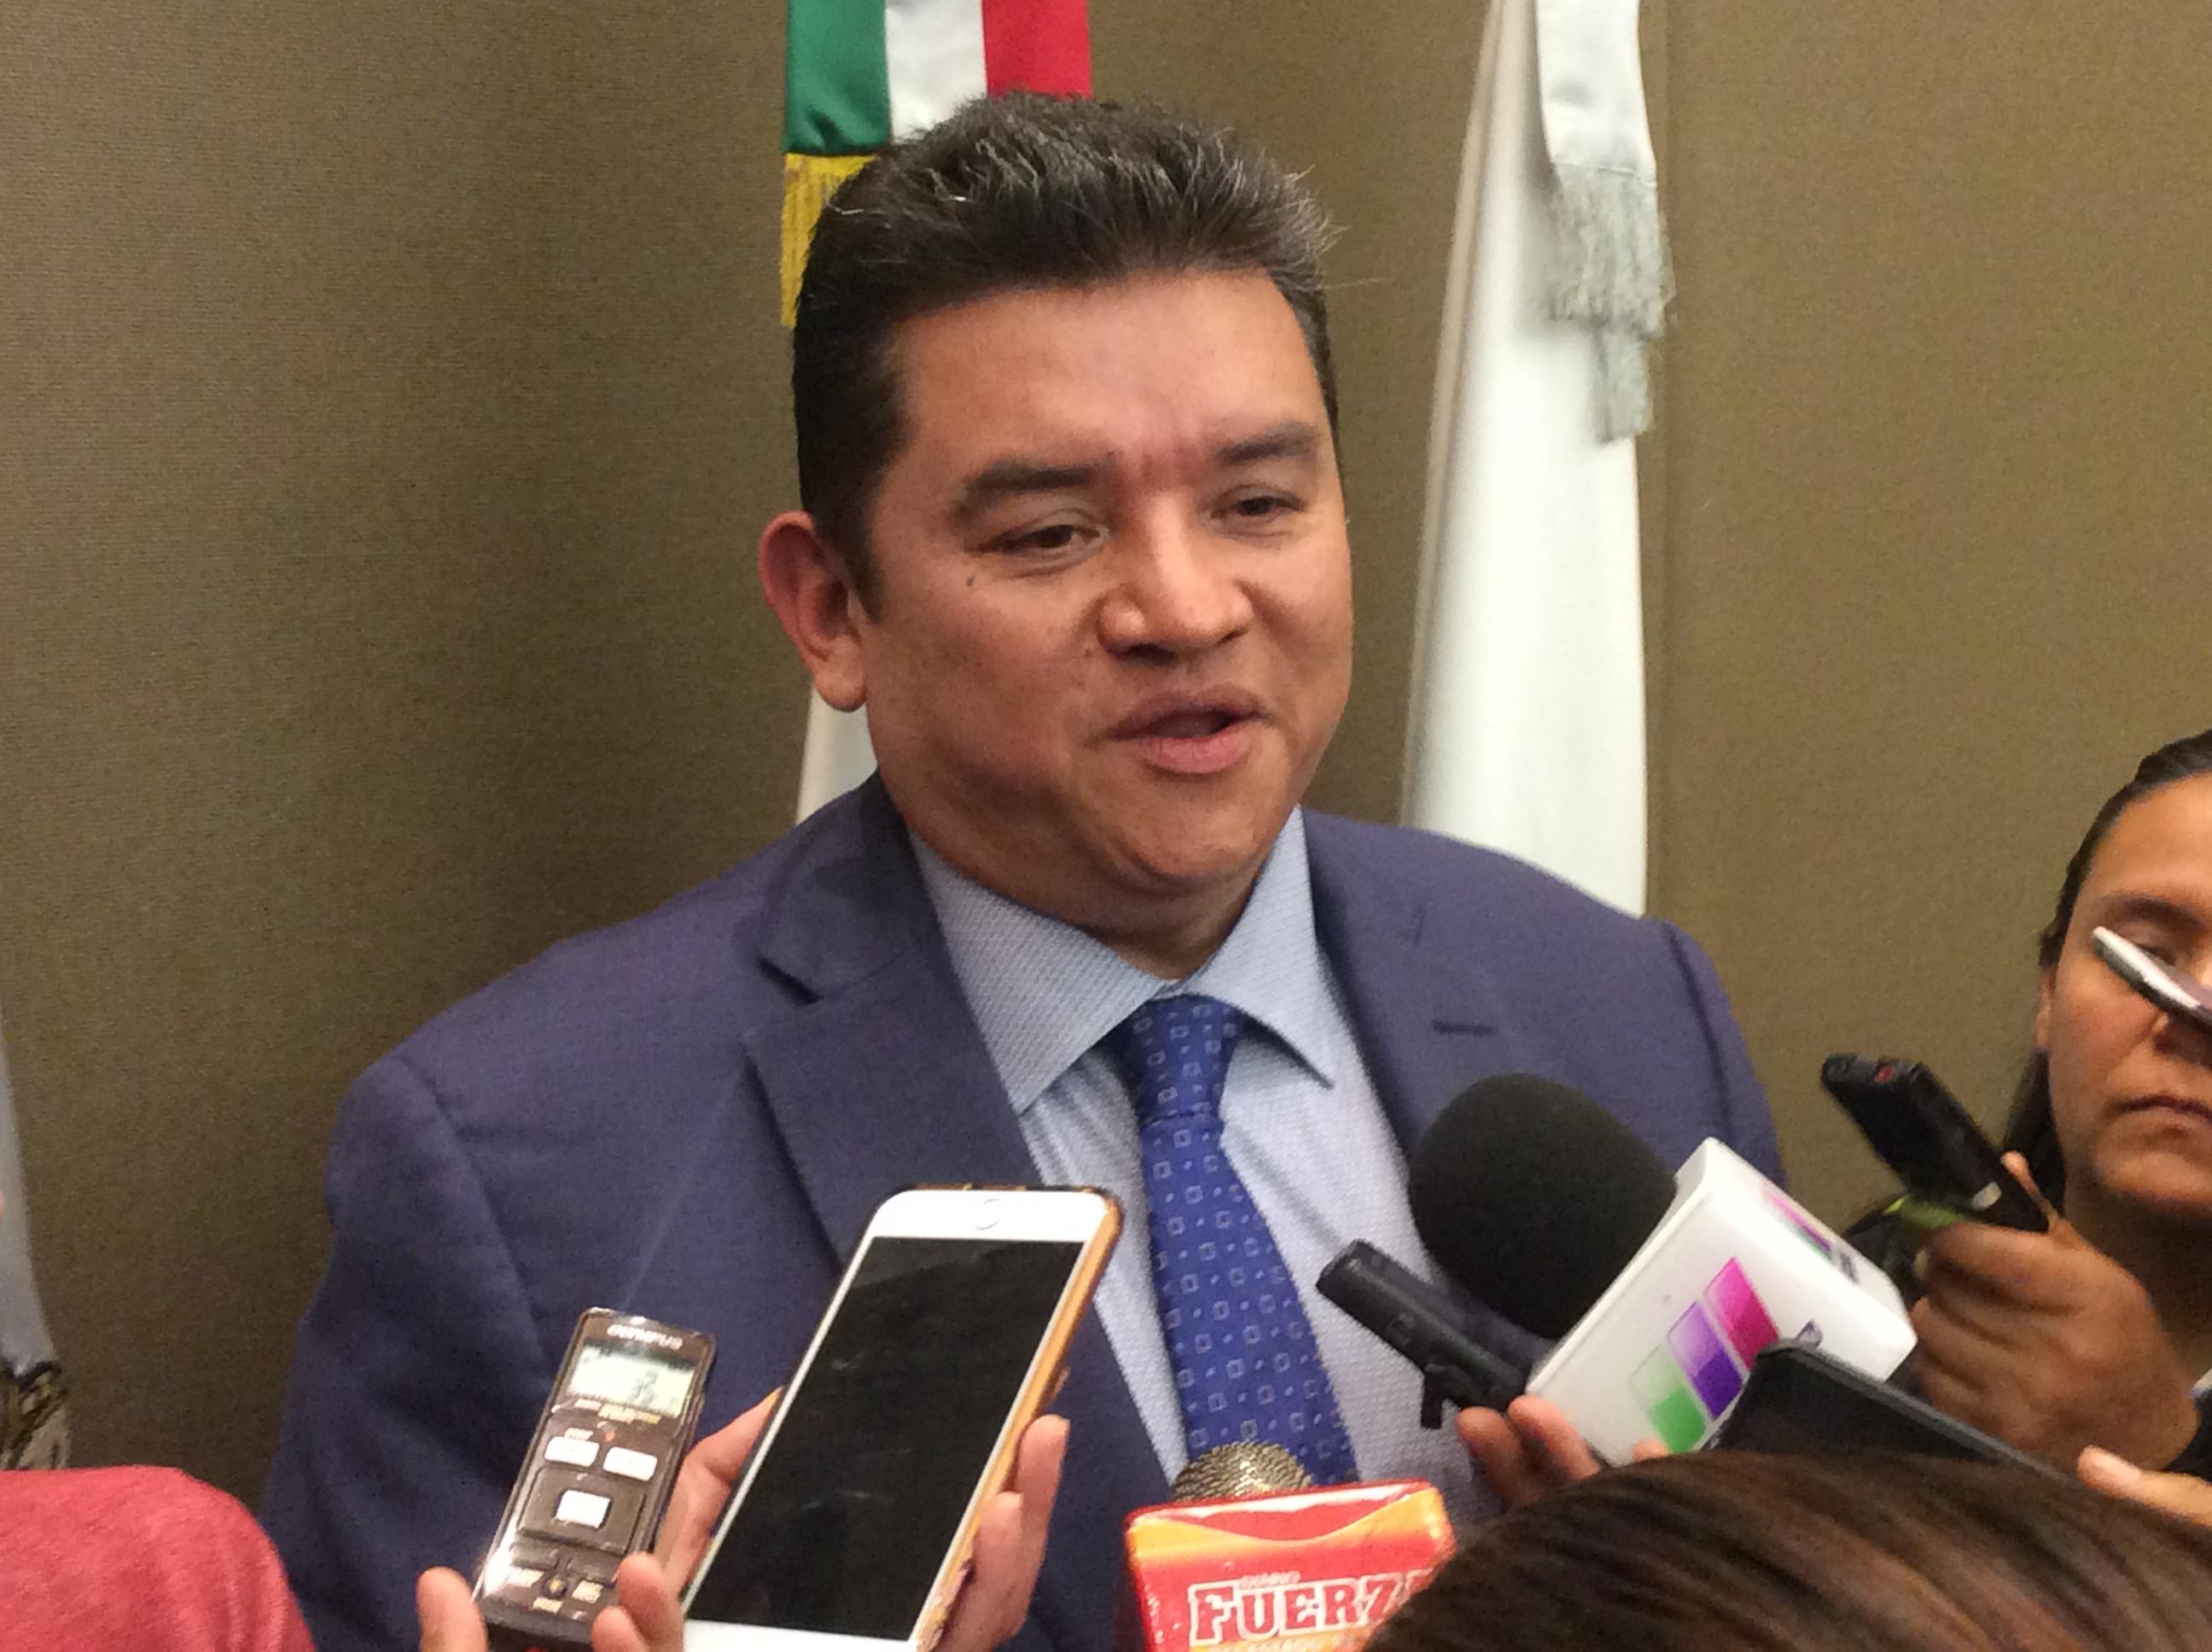 Ulises Ramírez cumplió, ya bajó su informe de Facebook